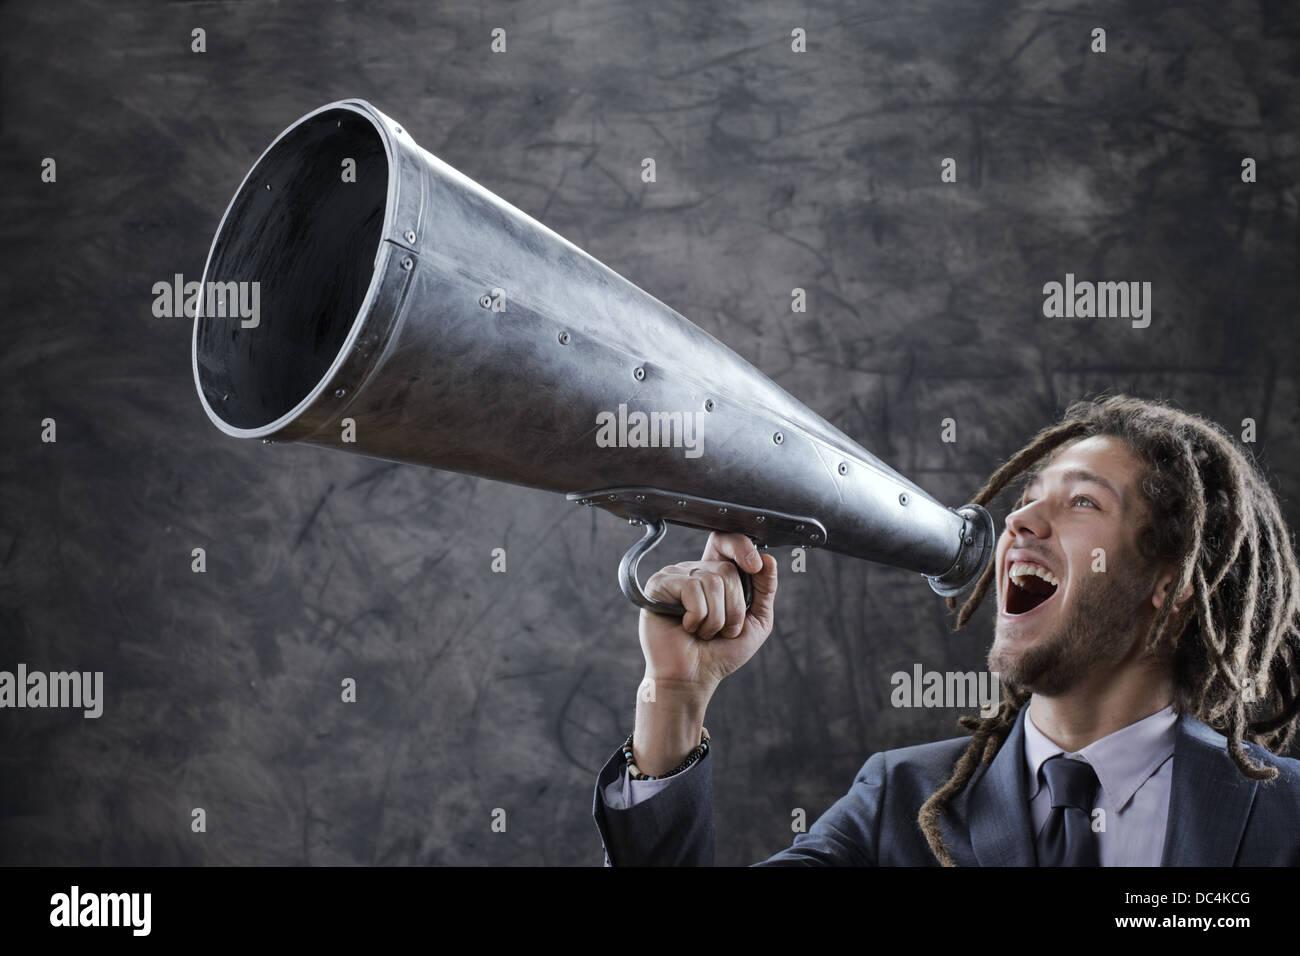 Cris dans megaphone Photo Stock